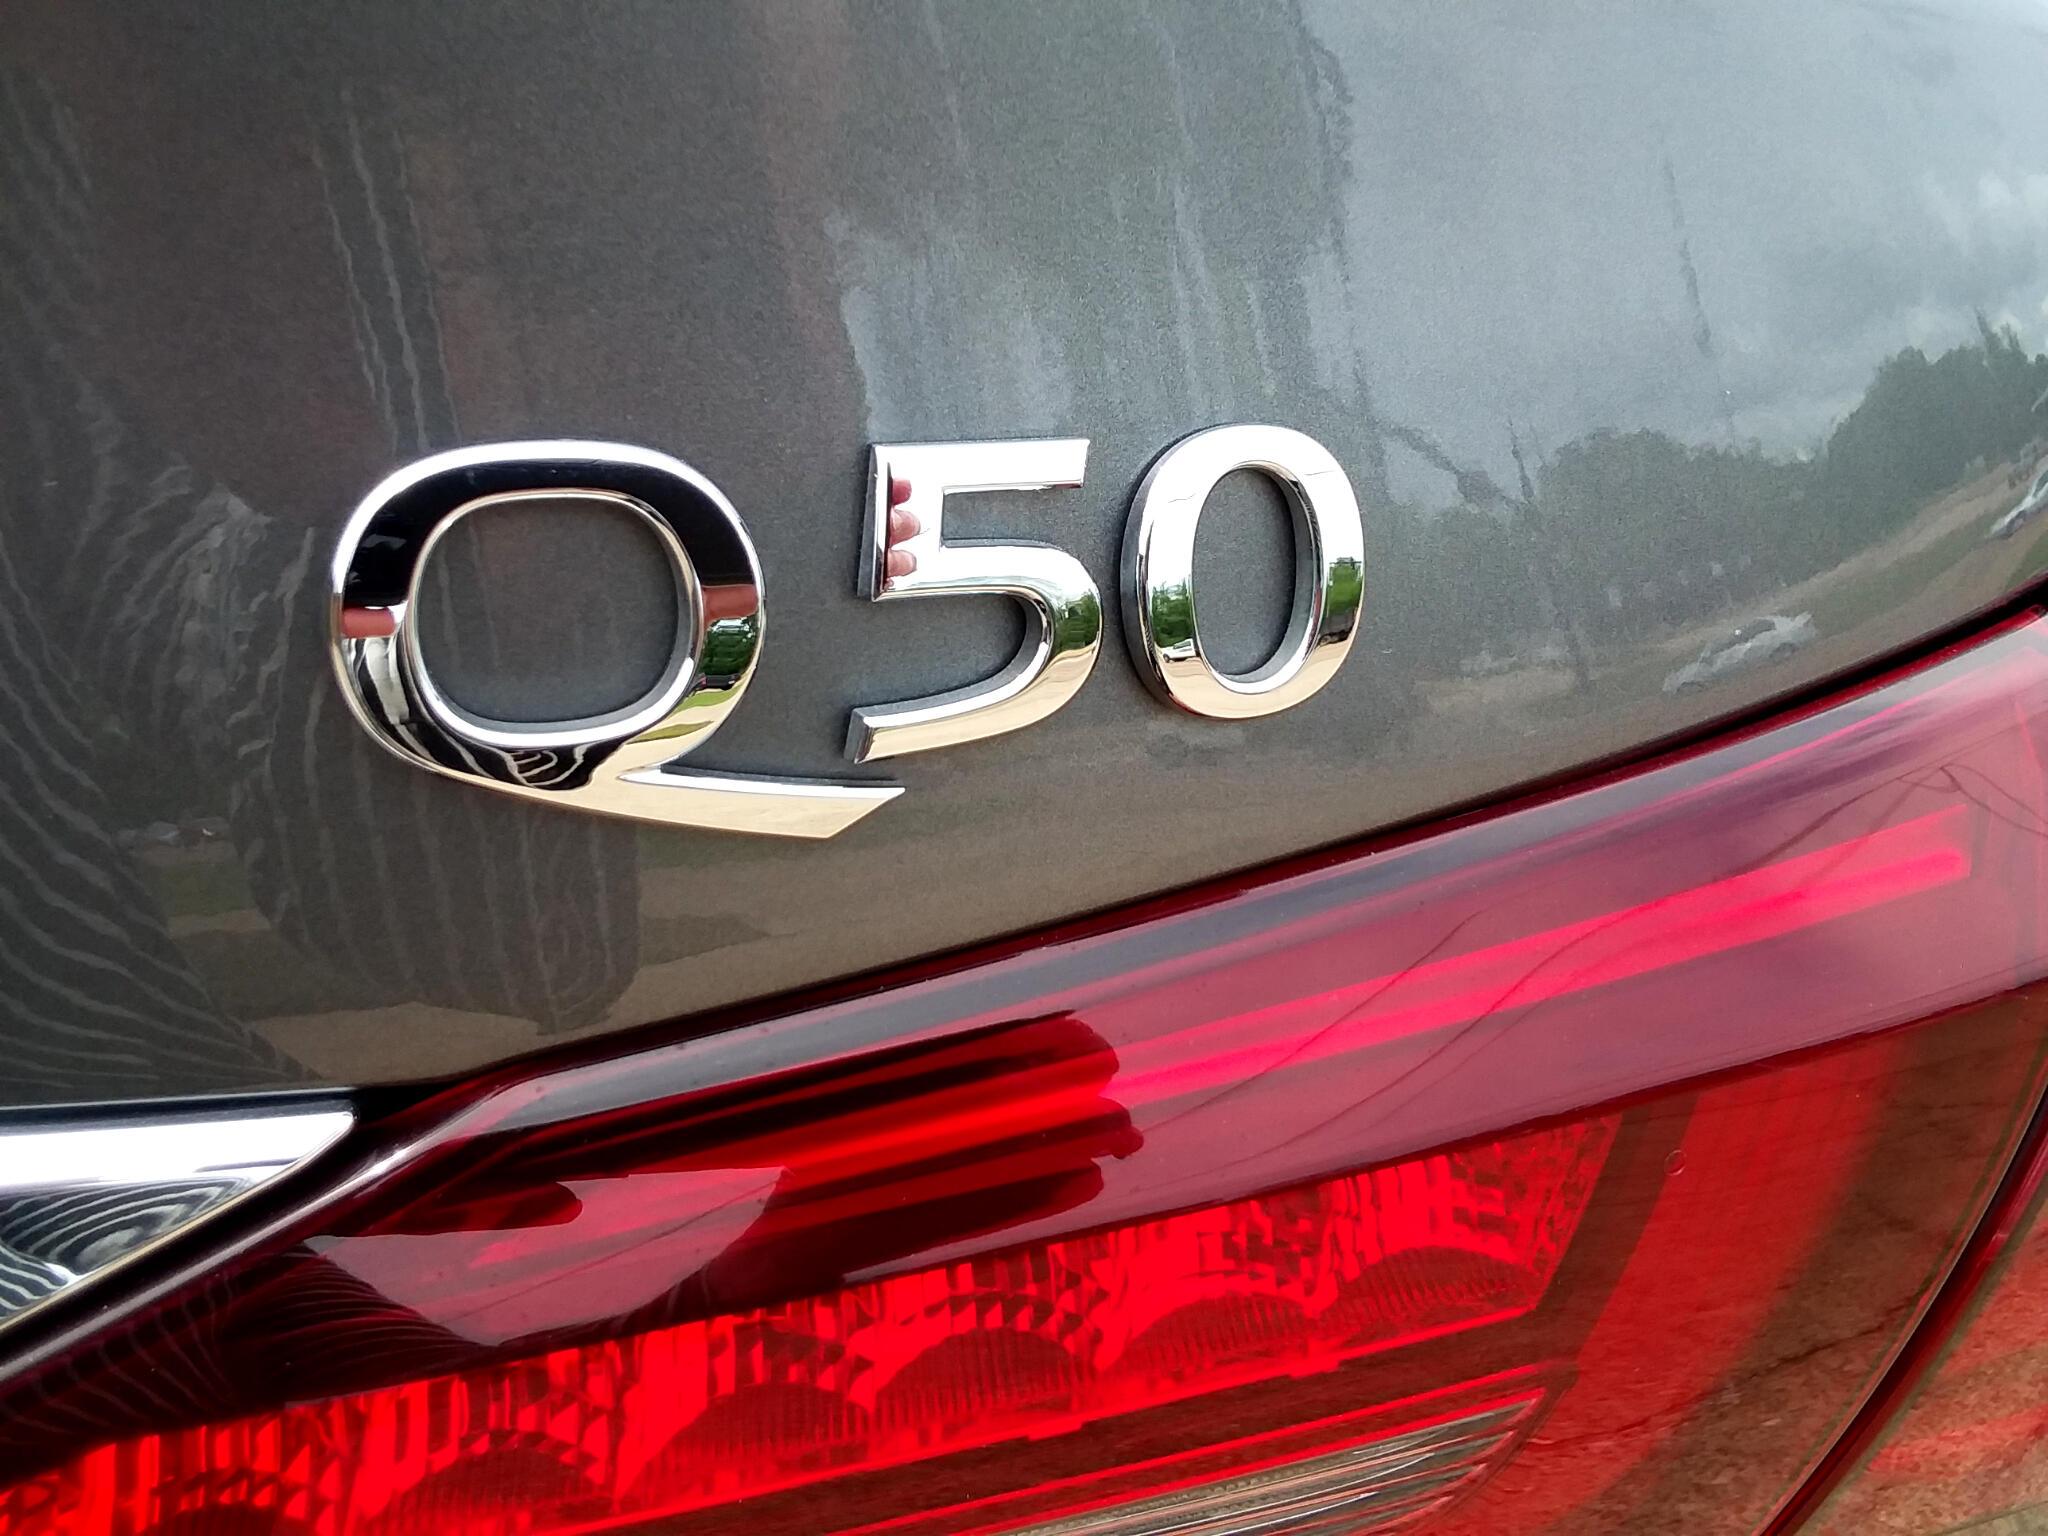 2018 Infiniti Q50 3.0t LUXE RWD